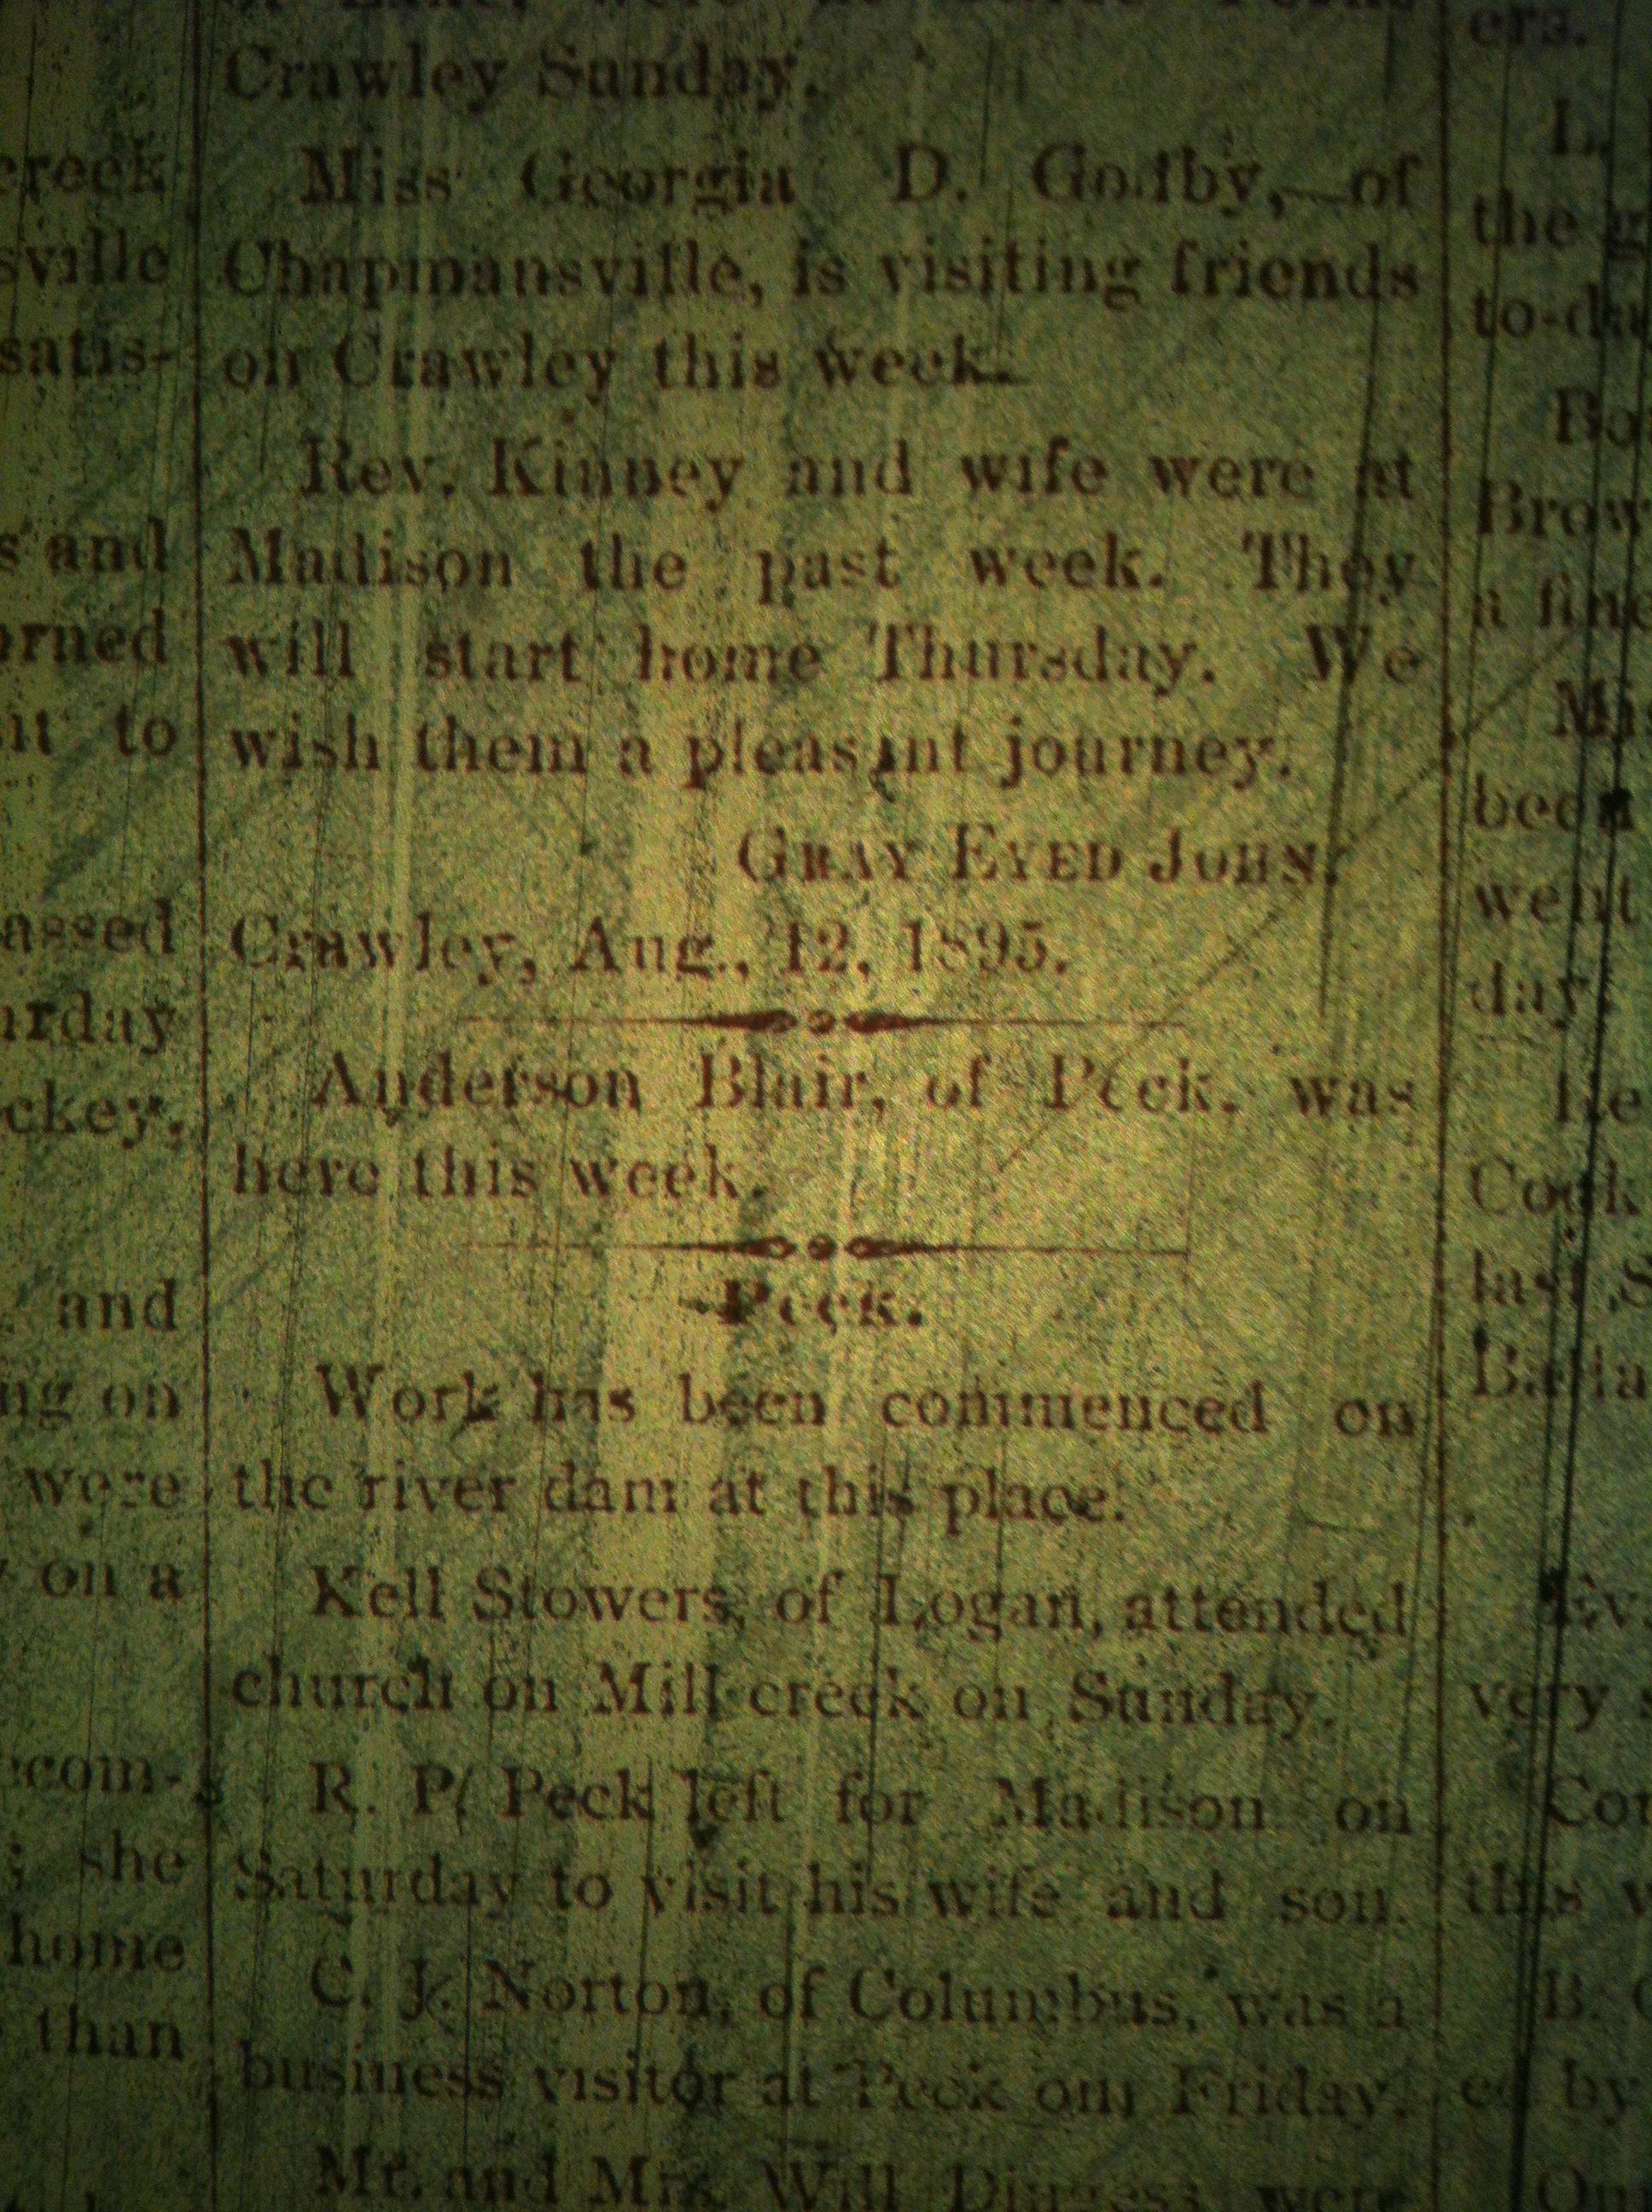 Anderson Blair LCB 08.14.1895